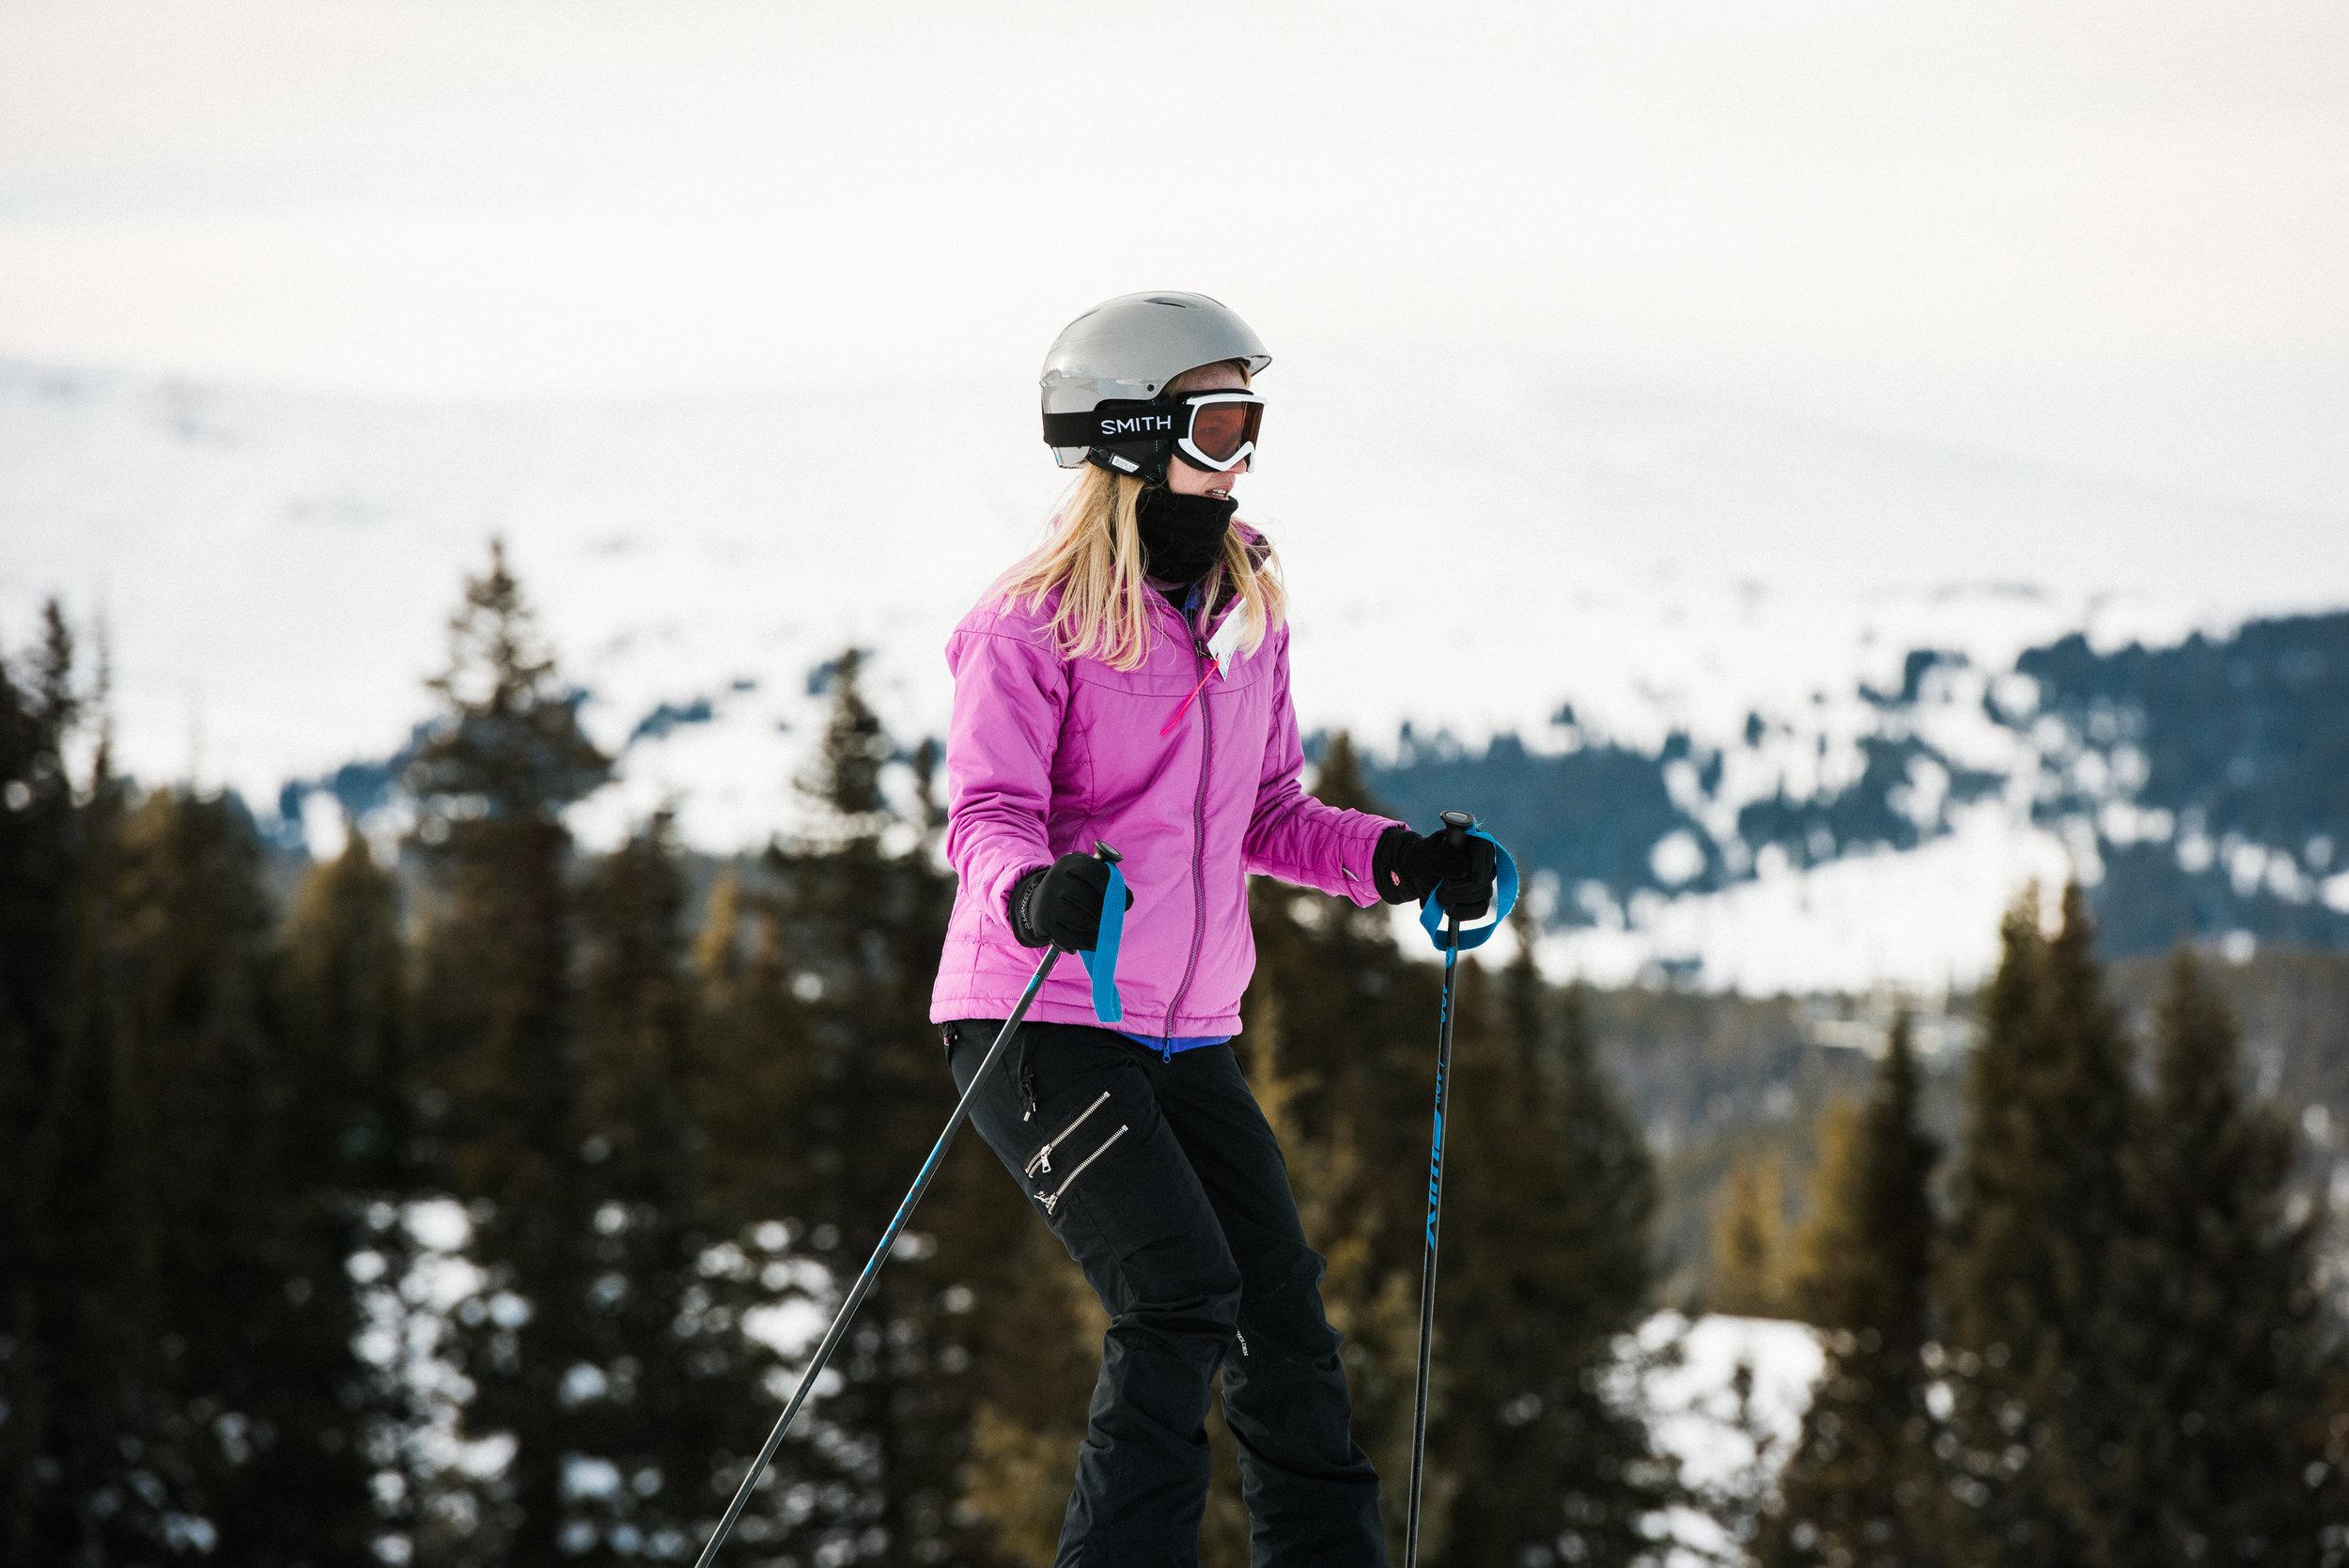 TaraShupe_Outdoor_Photographer_Loweprobags_Colorado_Copper_Mountains_Ski_69.jpg